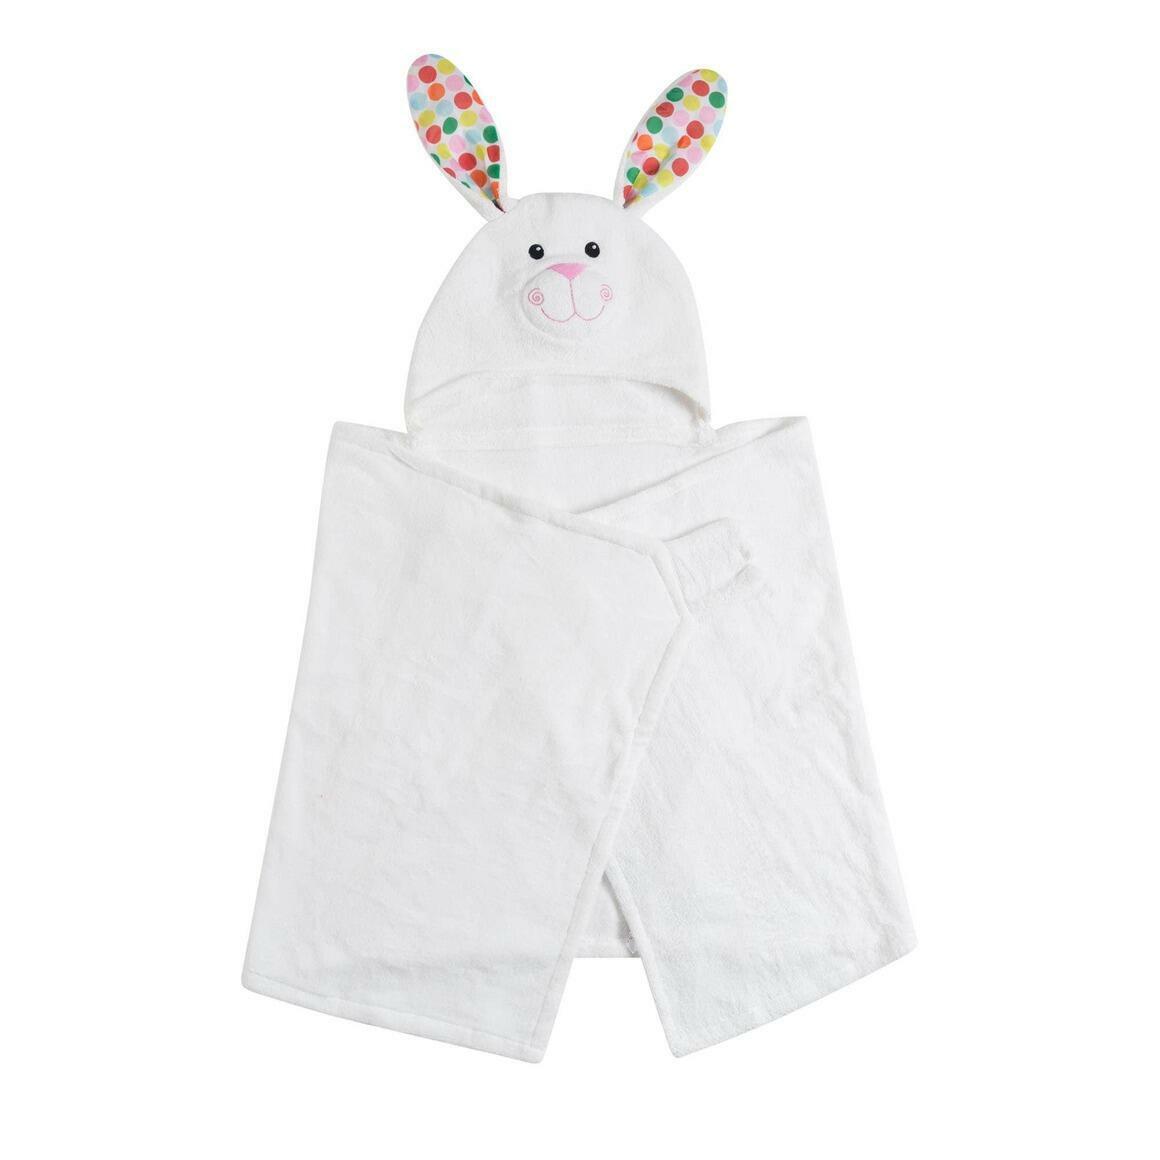 Bella the Bunny Toddler Towel | Trada Marketplace